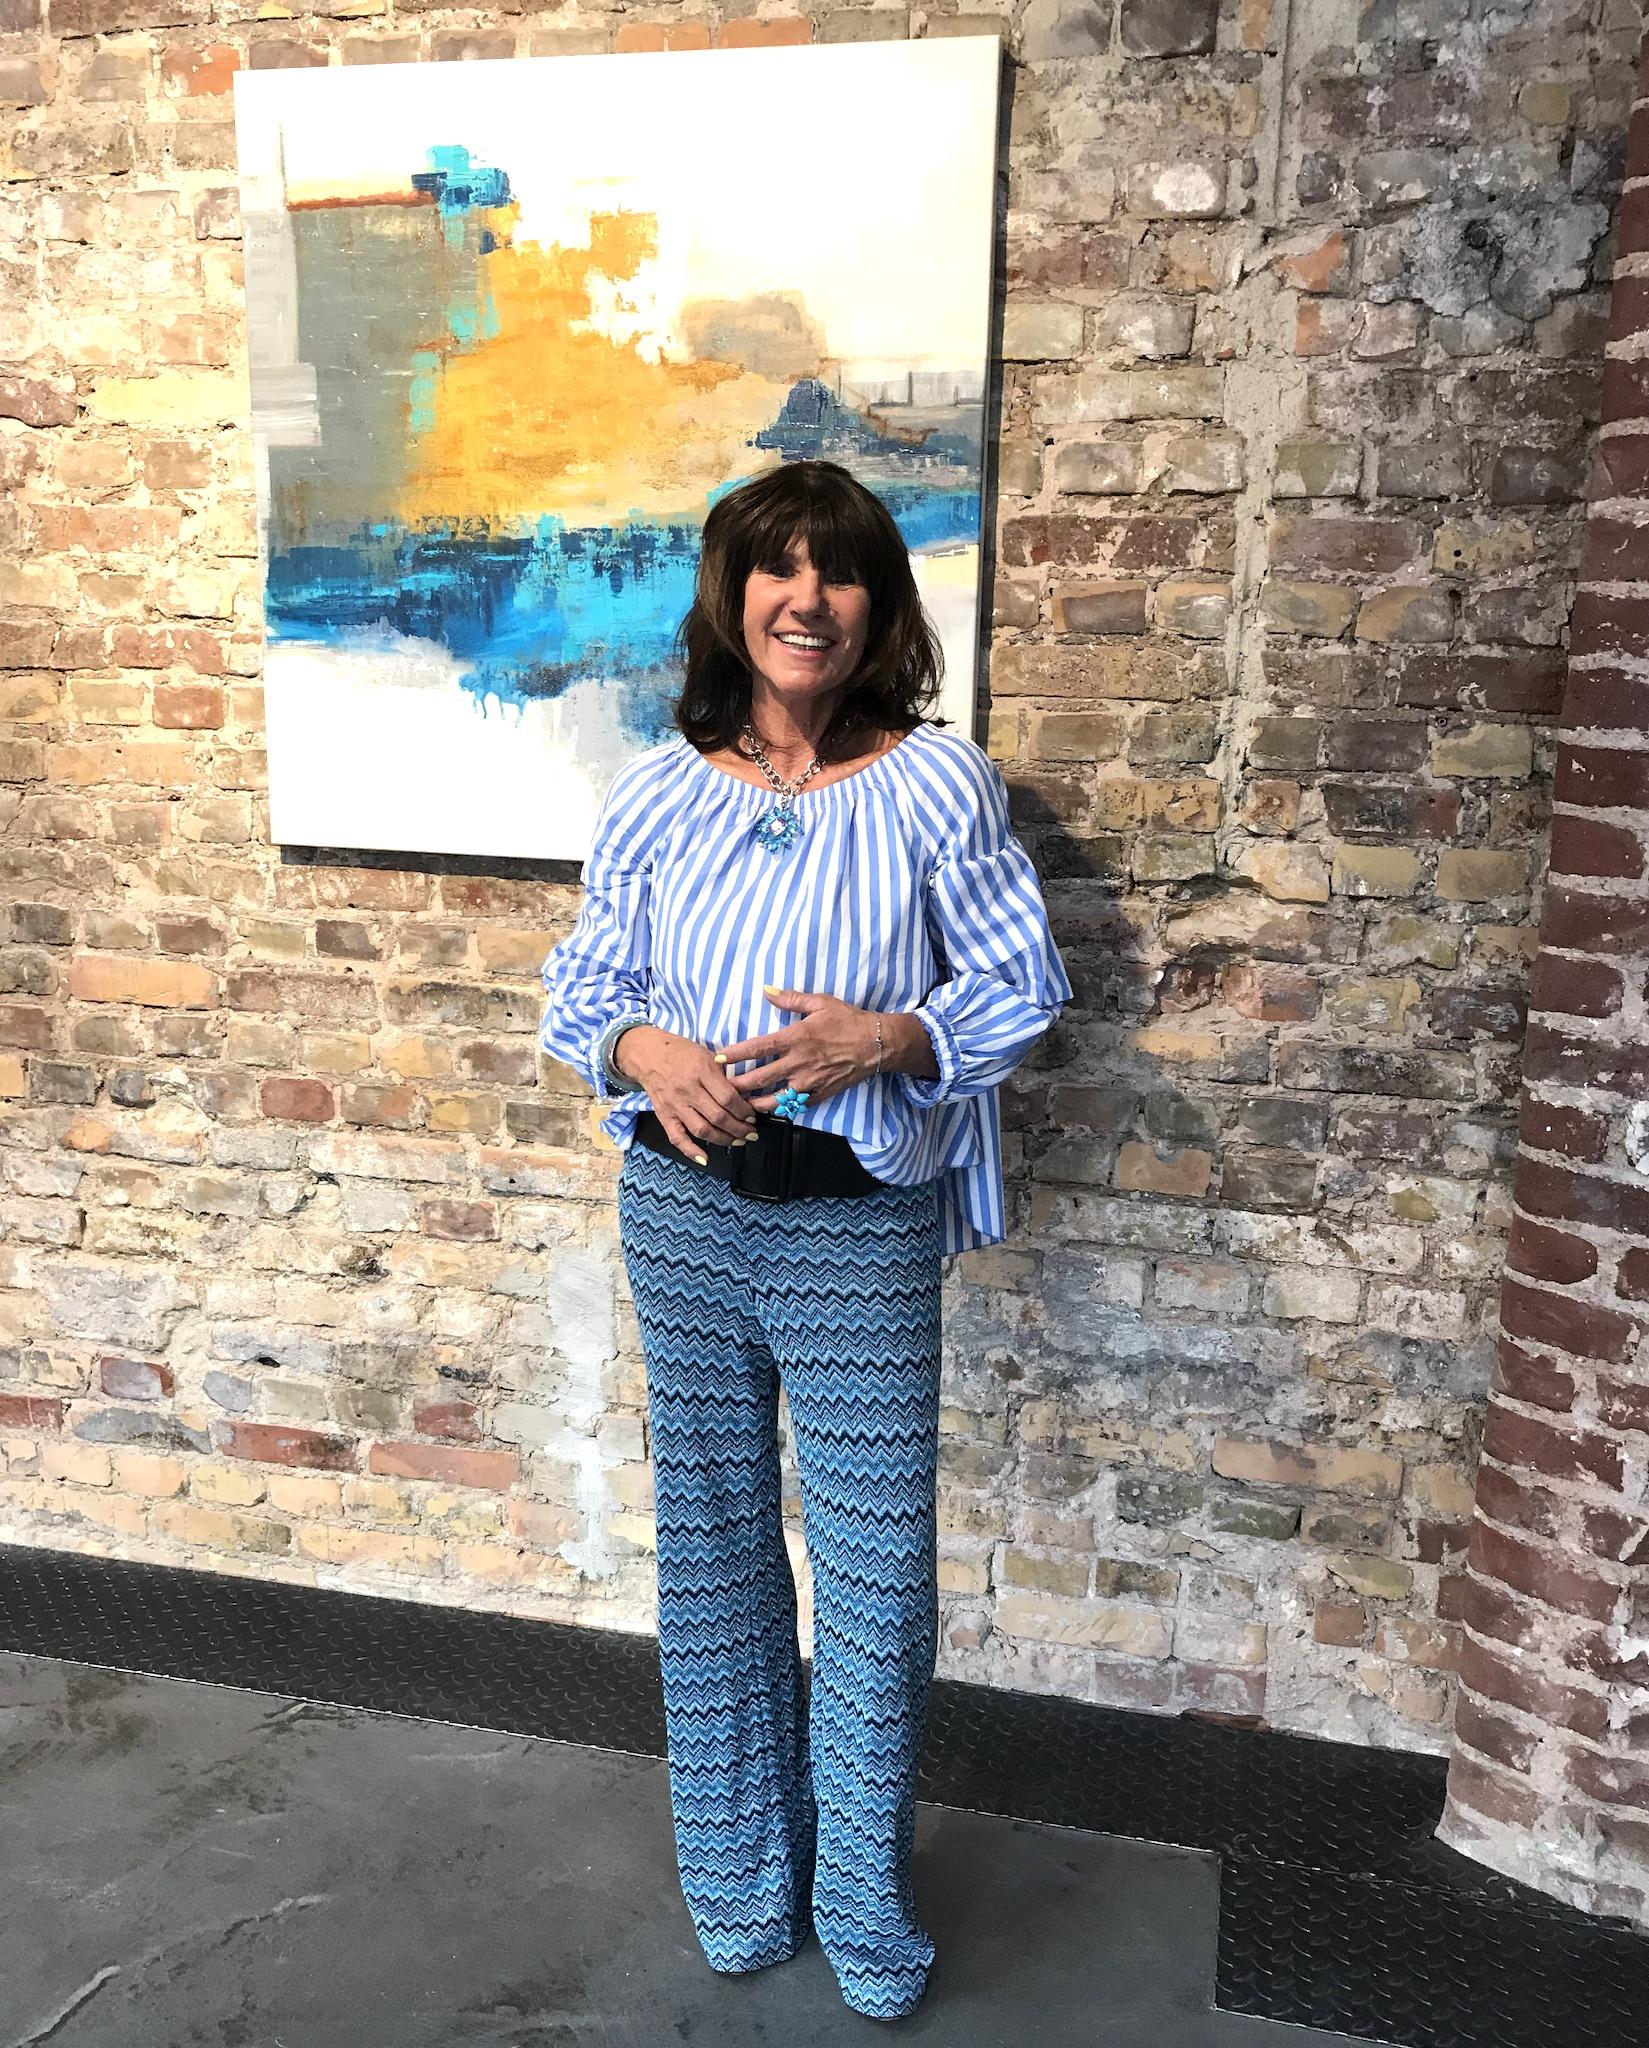 Ariane Paffrath, Gallery Ariane Paffrath, Missoni Hose,Lifestyle-Blog, Lieblingsstil.com,